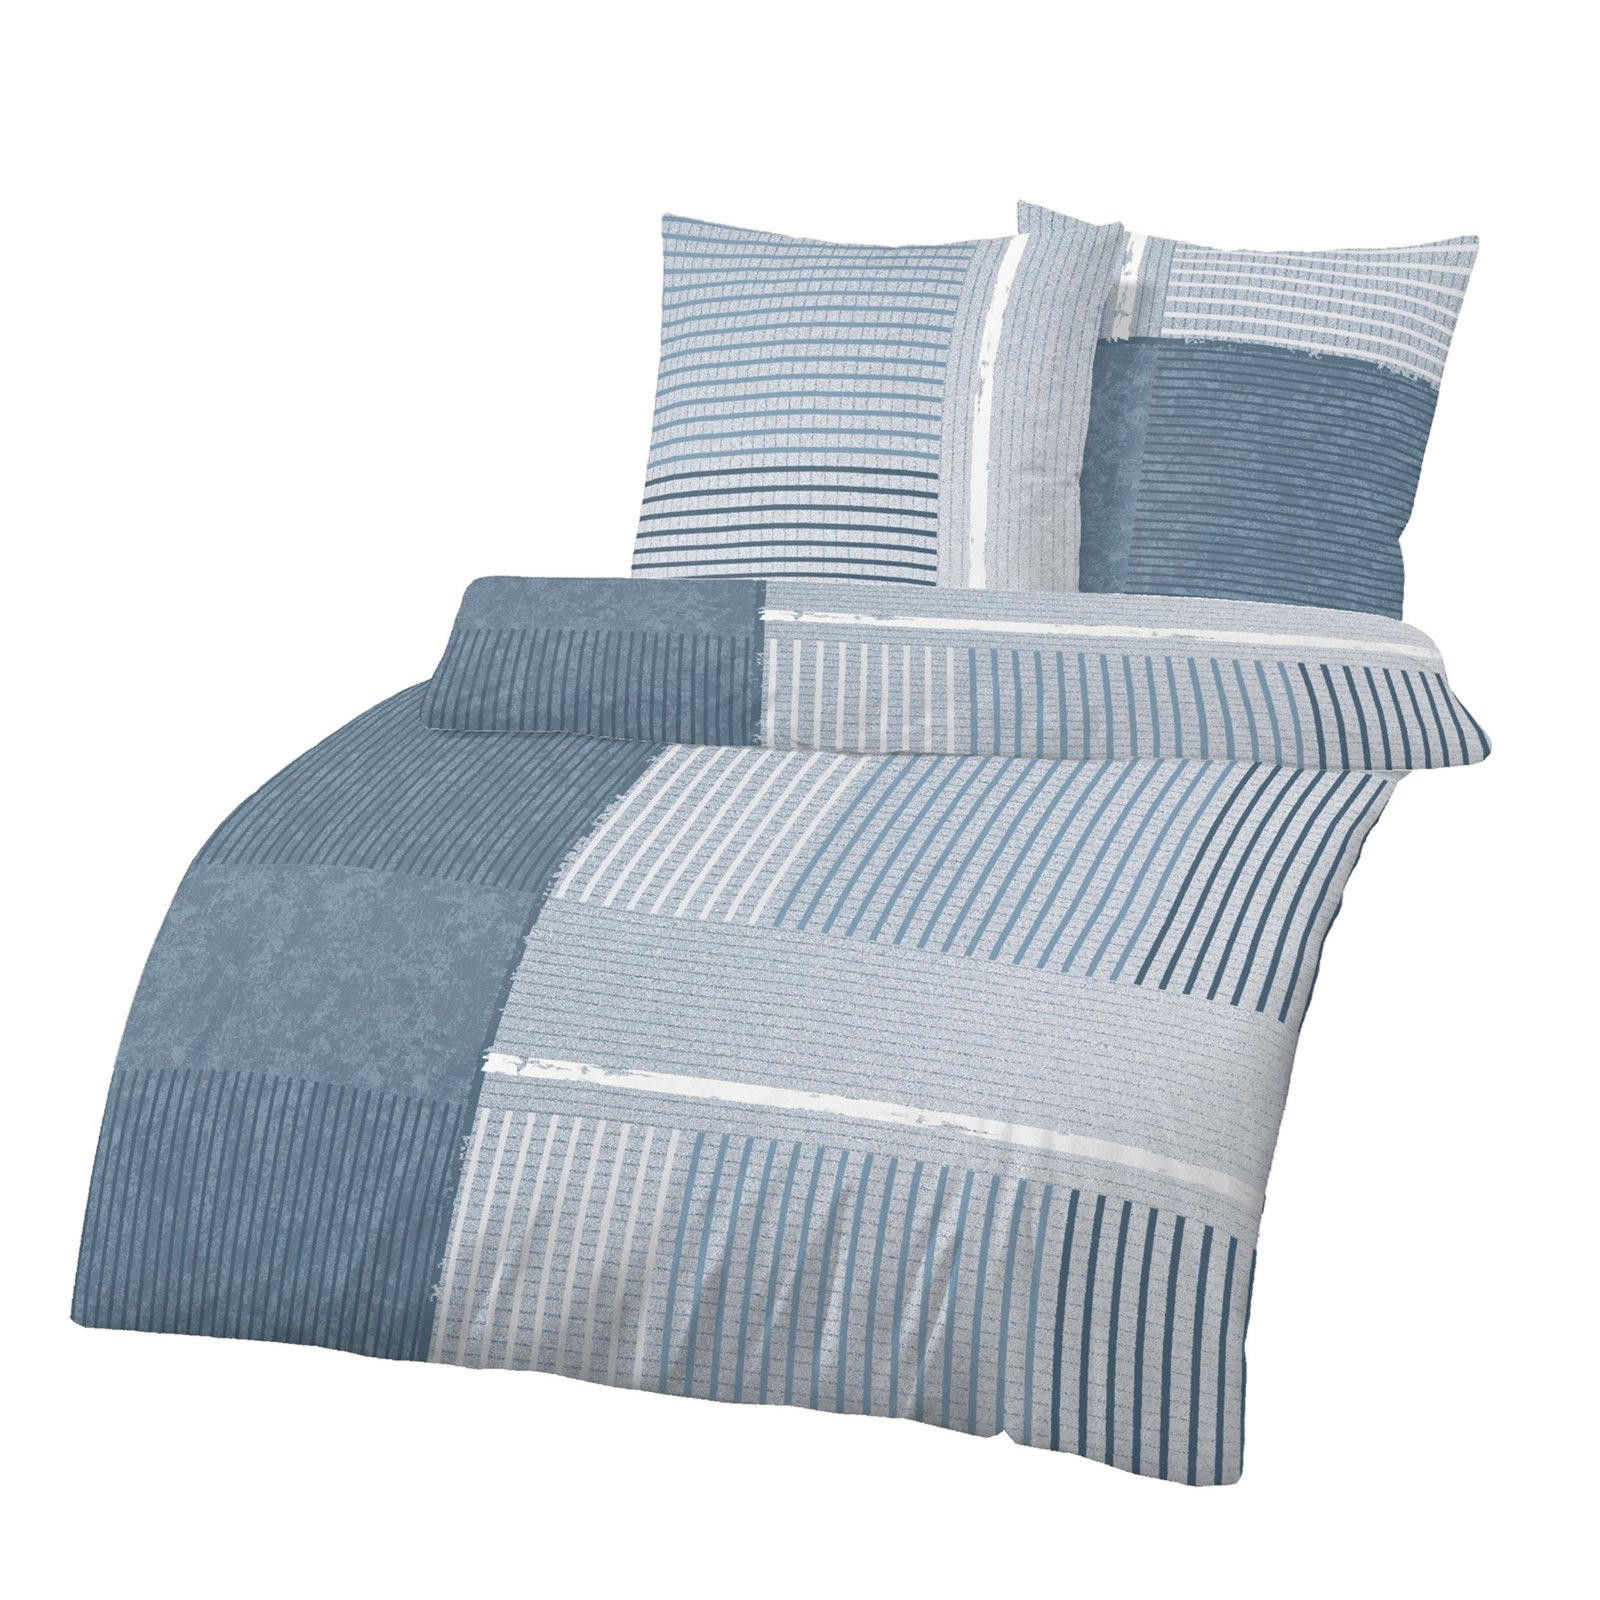 biber bettw sche jeans blau pigmente 155x220 cm bettw sche bettw sche bettlaken. Black Bedroom Furniture Sets. Home Design Ideas